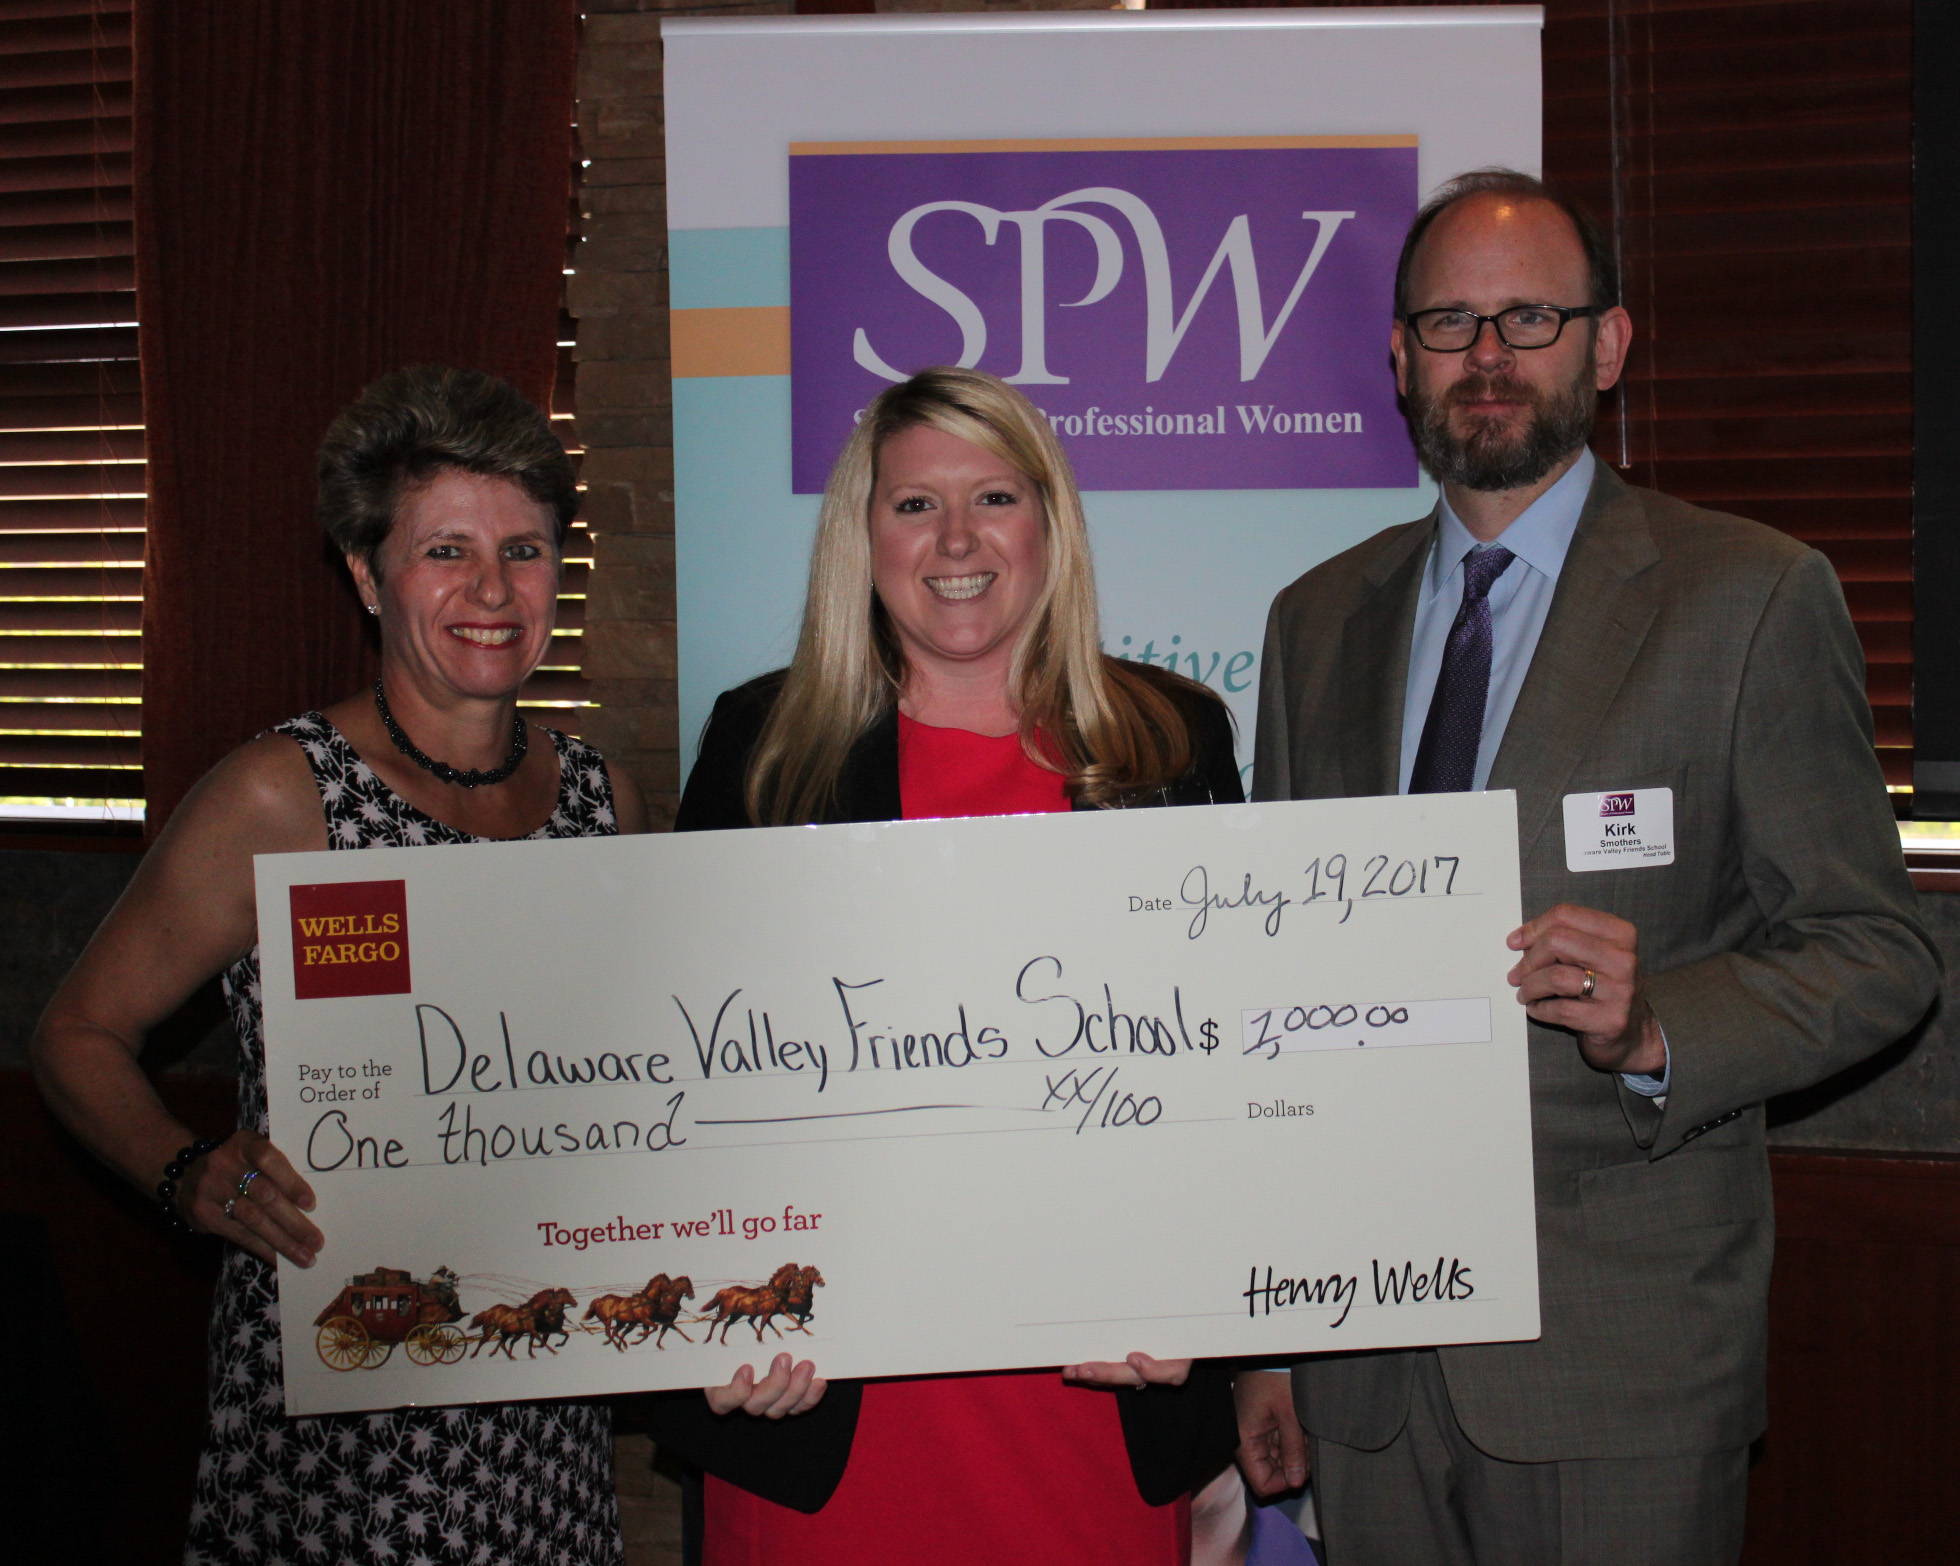 Featured Non-Profit Delaware Valley Friends School